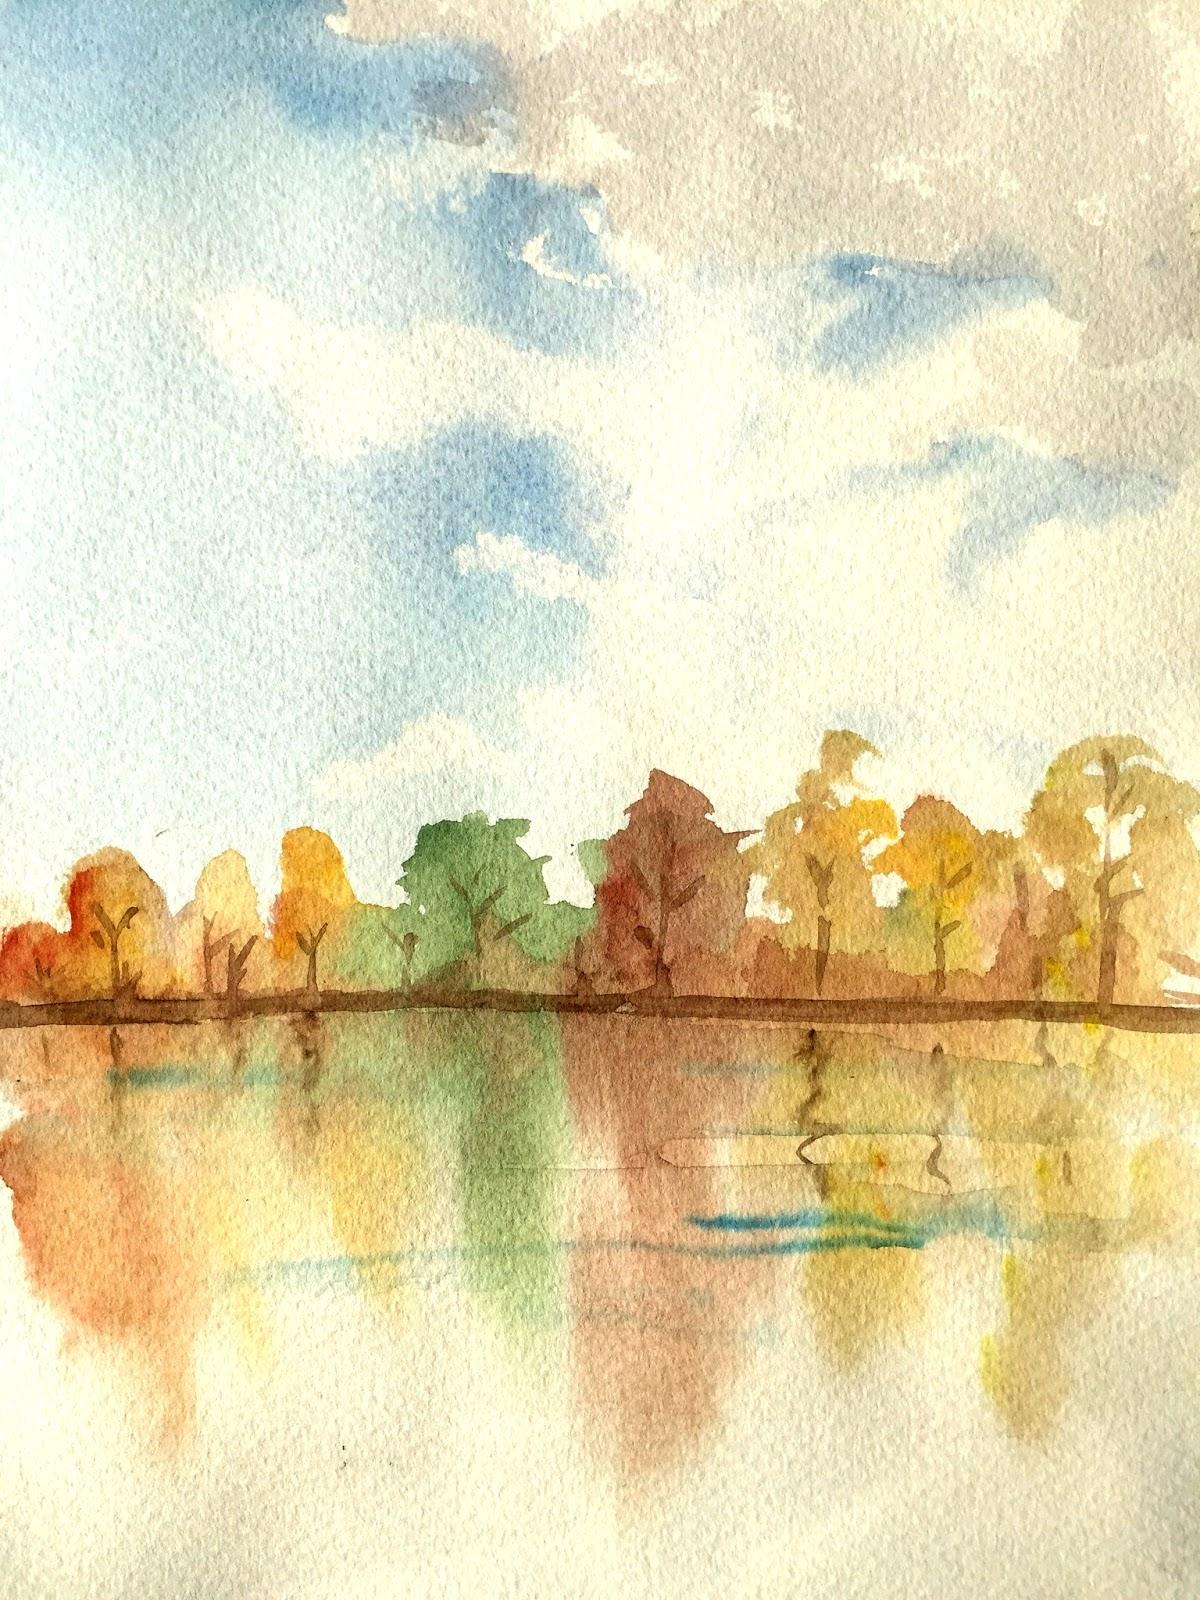 Watercolor Landscape Study by Artmagenta